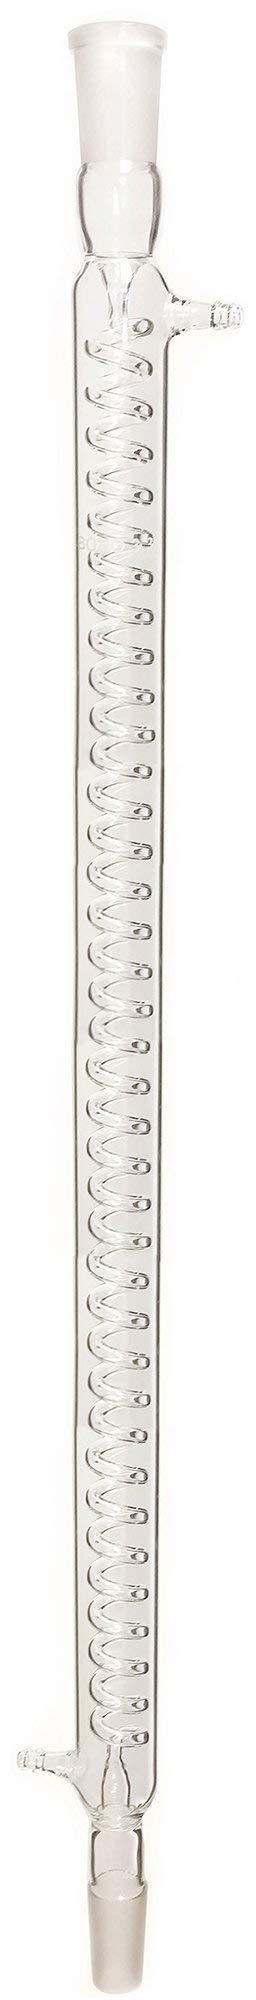 GSC International 4005-600 Borosilicate Graham Condenser, Ground Joints 24/40, 600 mm